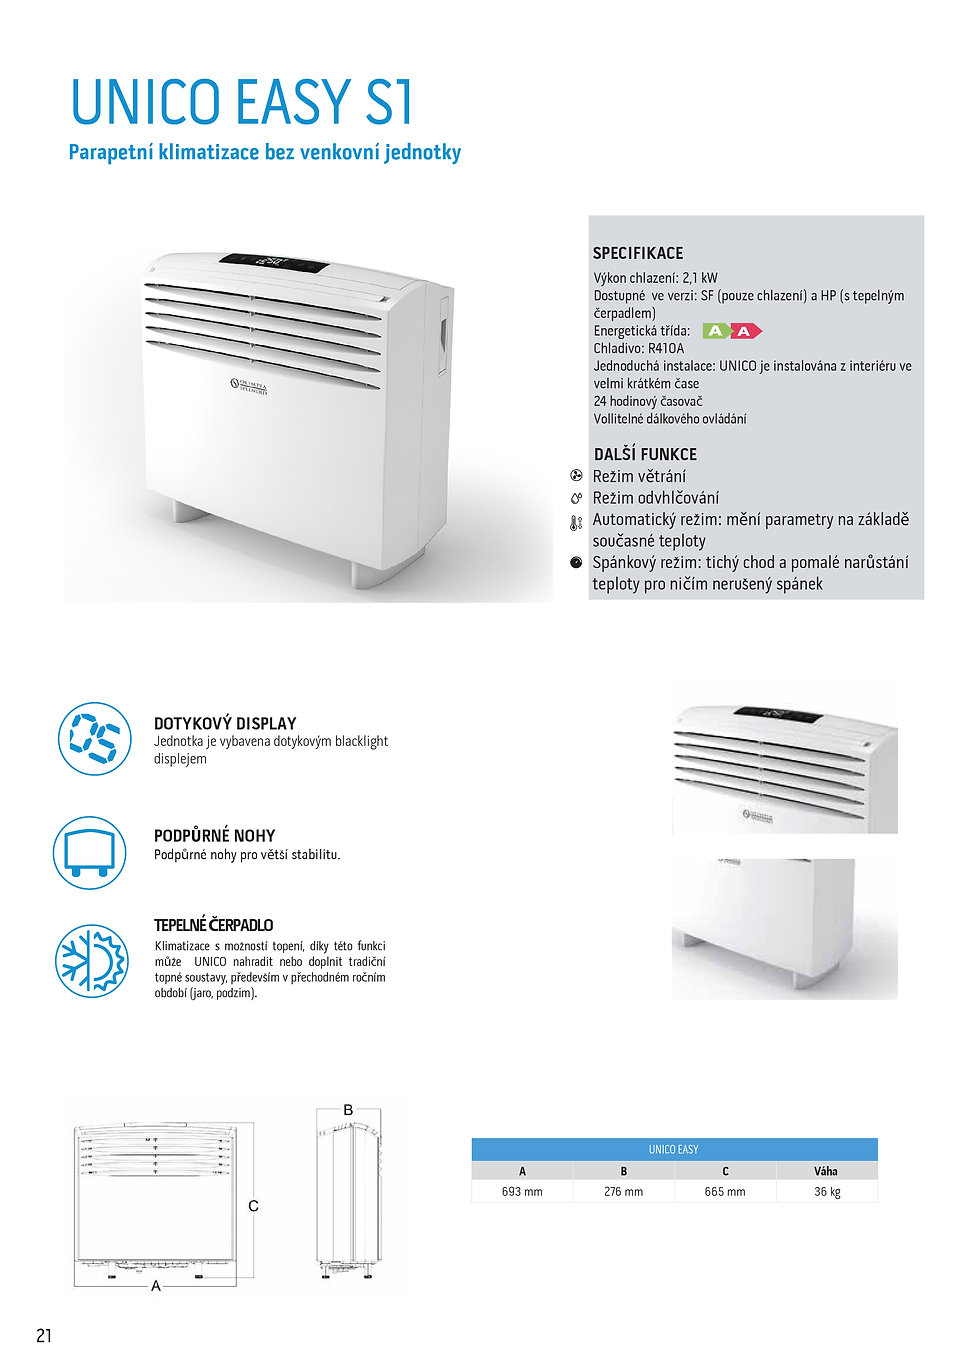 Katalog Unico 2021 Tradesam-23.jpg